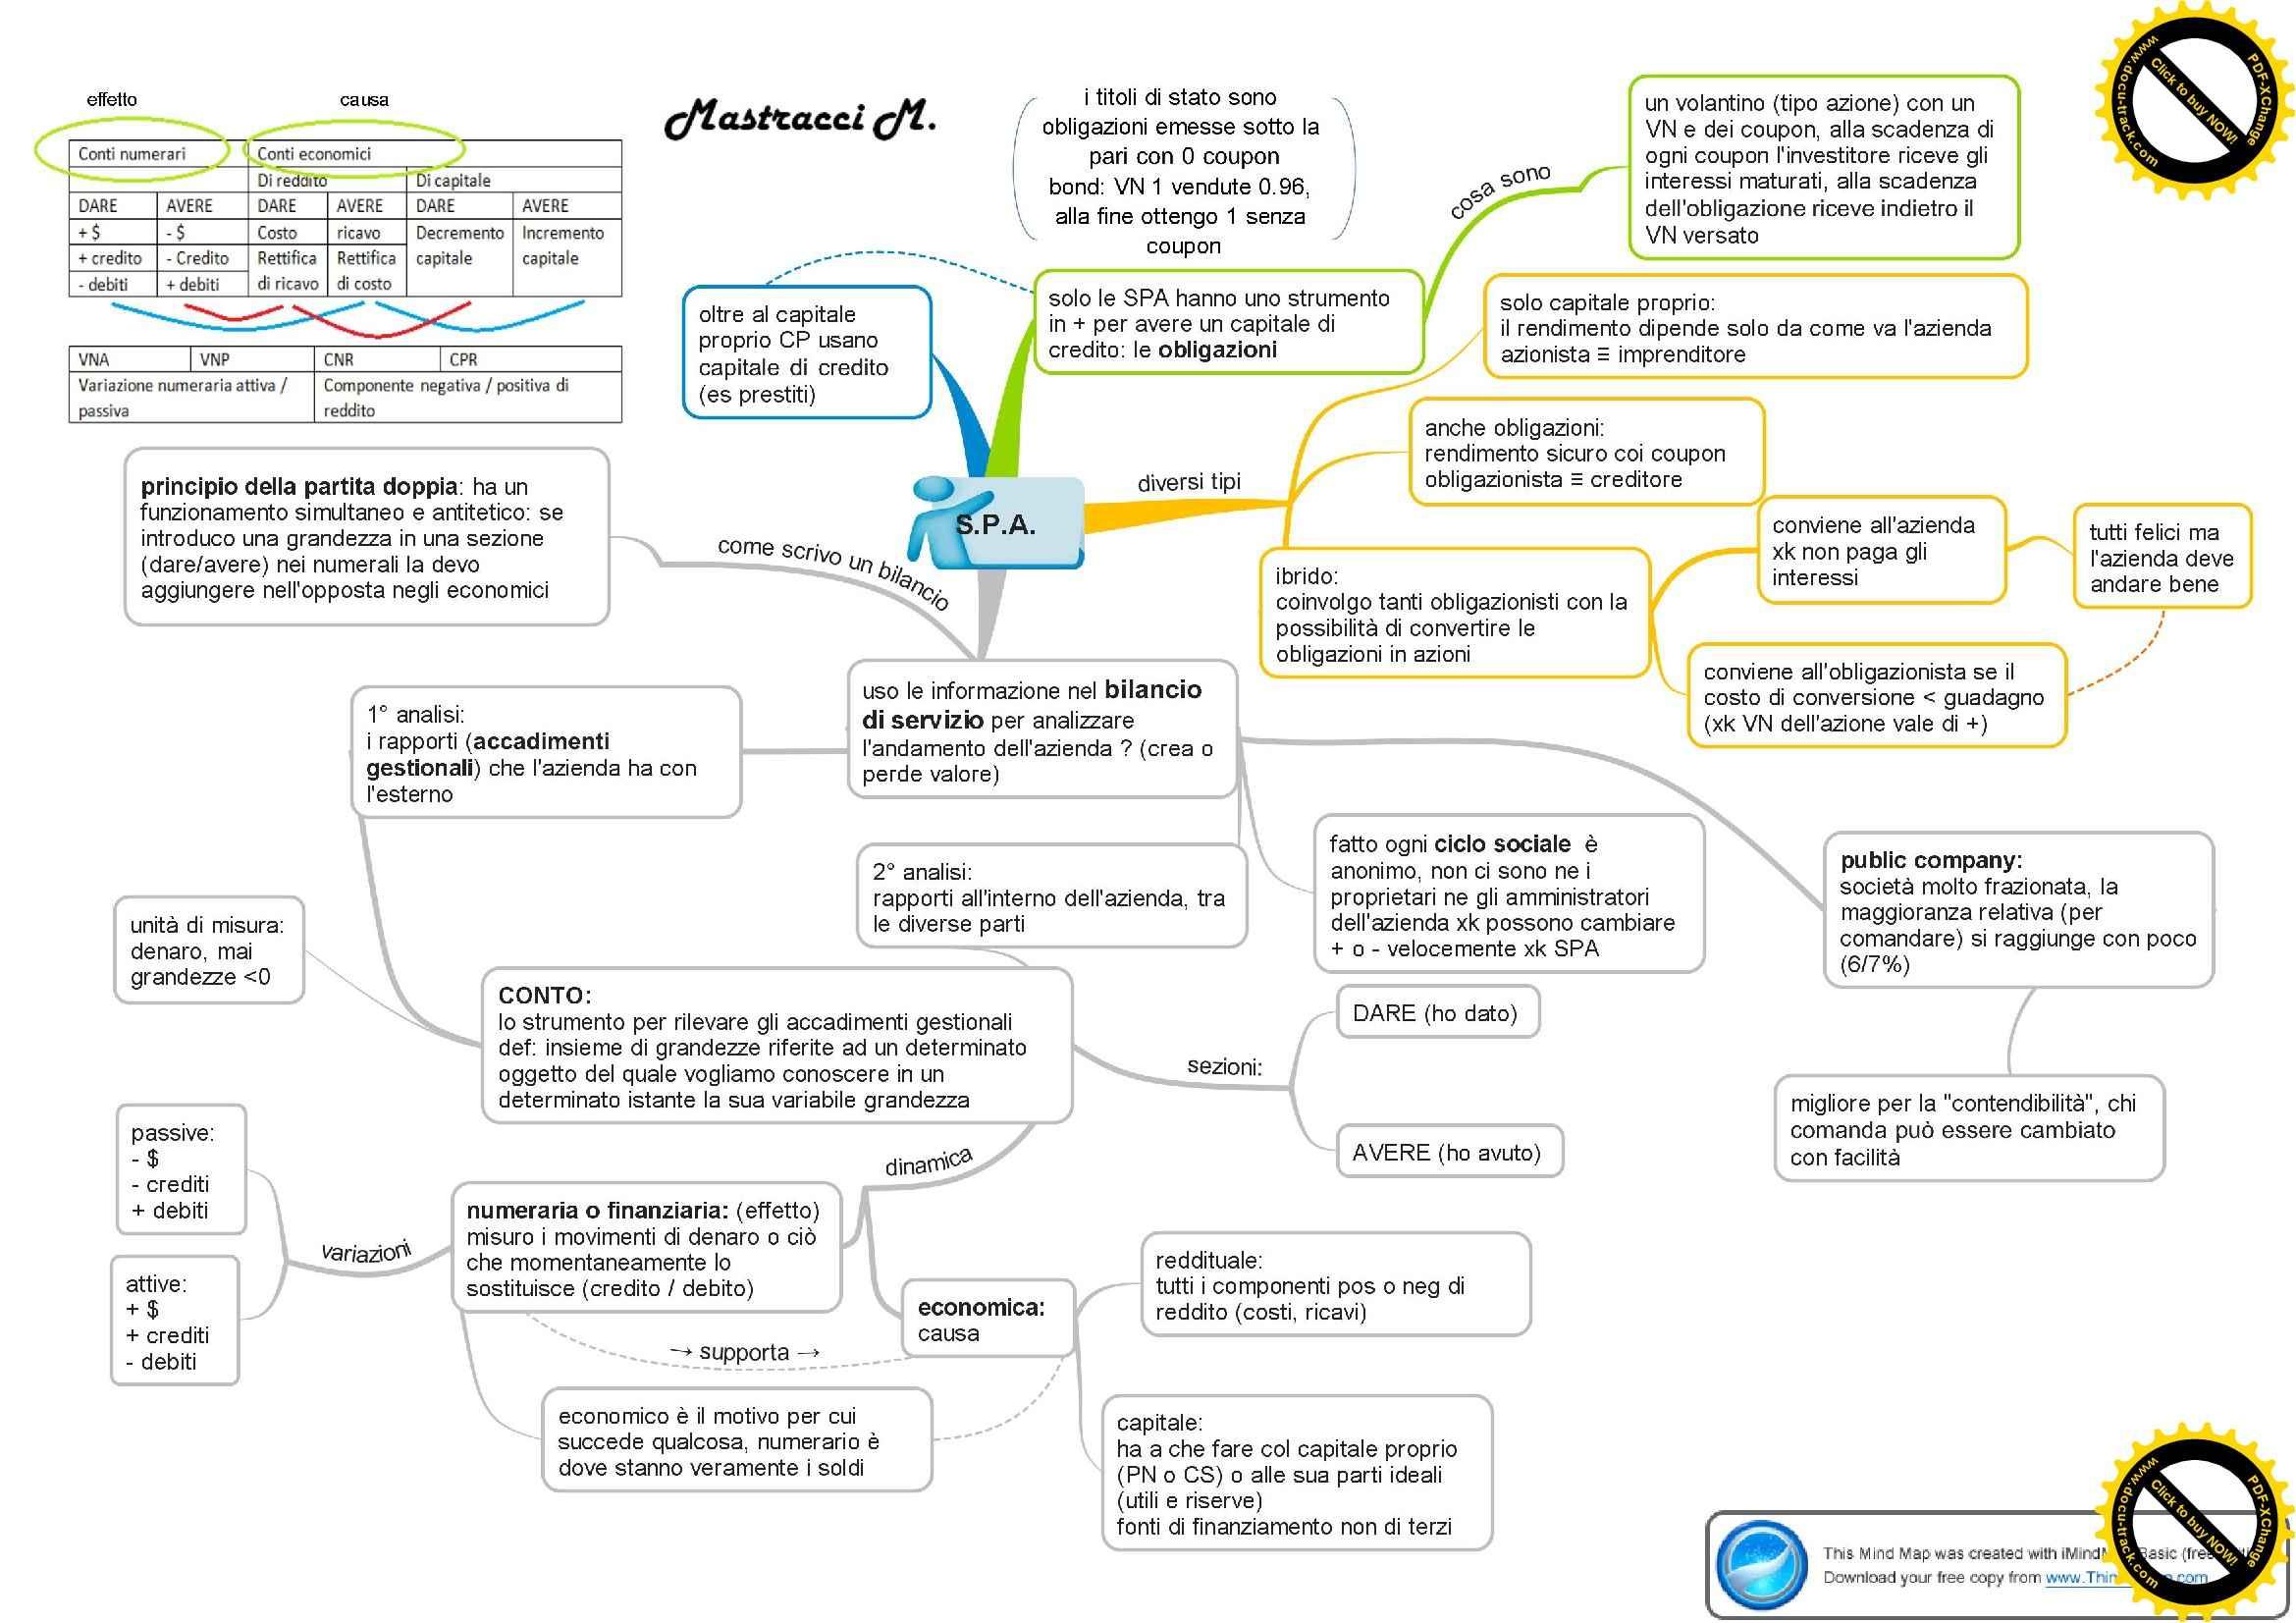 Gestione aziendale 1 - Schemi Pag. 2